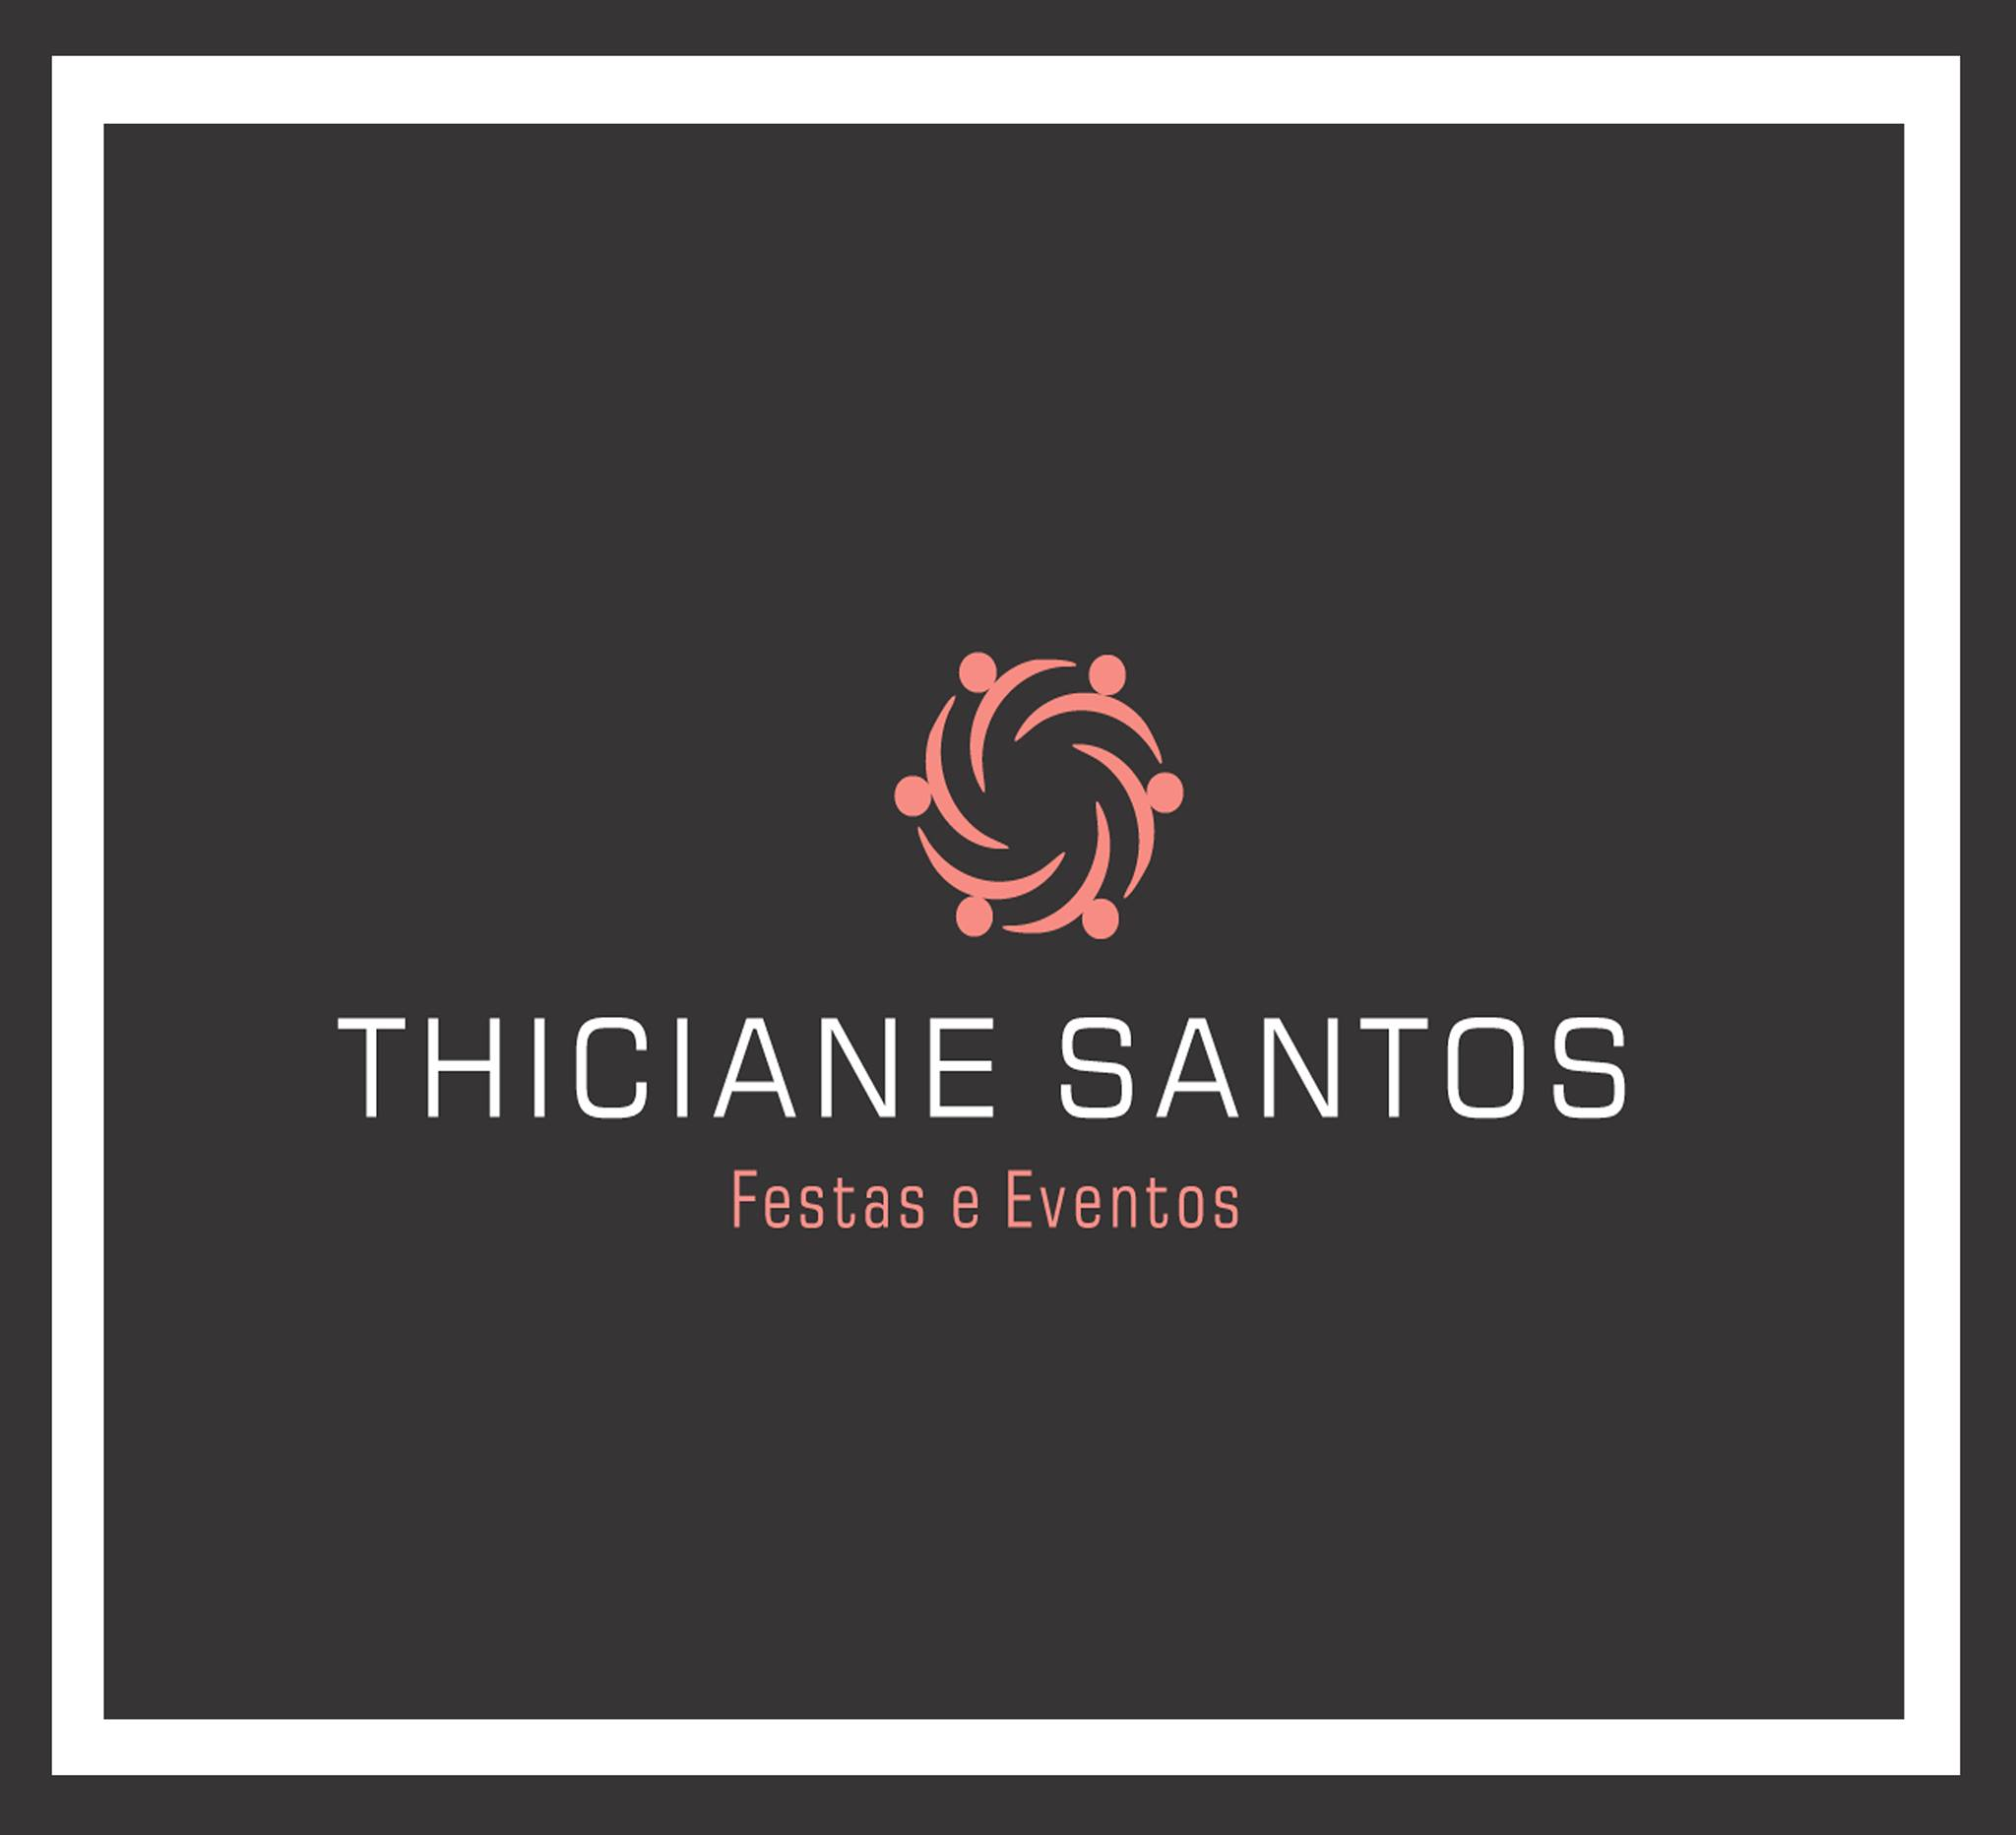 Thiciane Santos